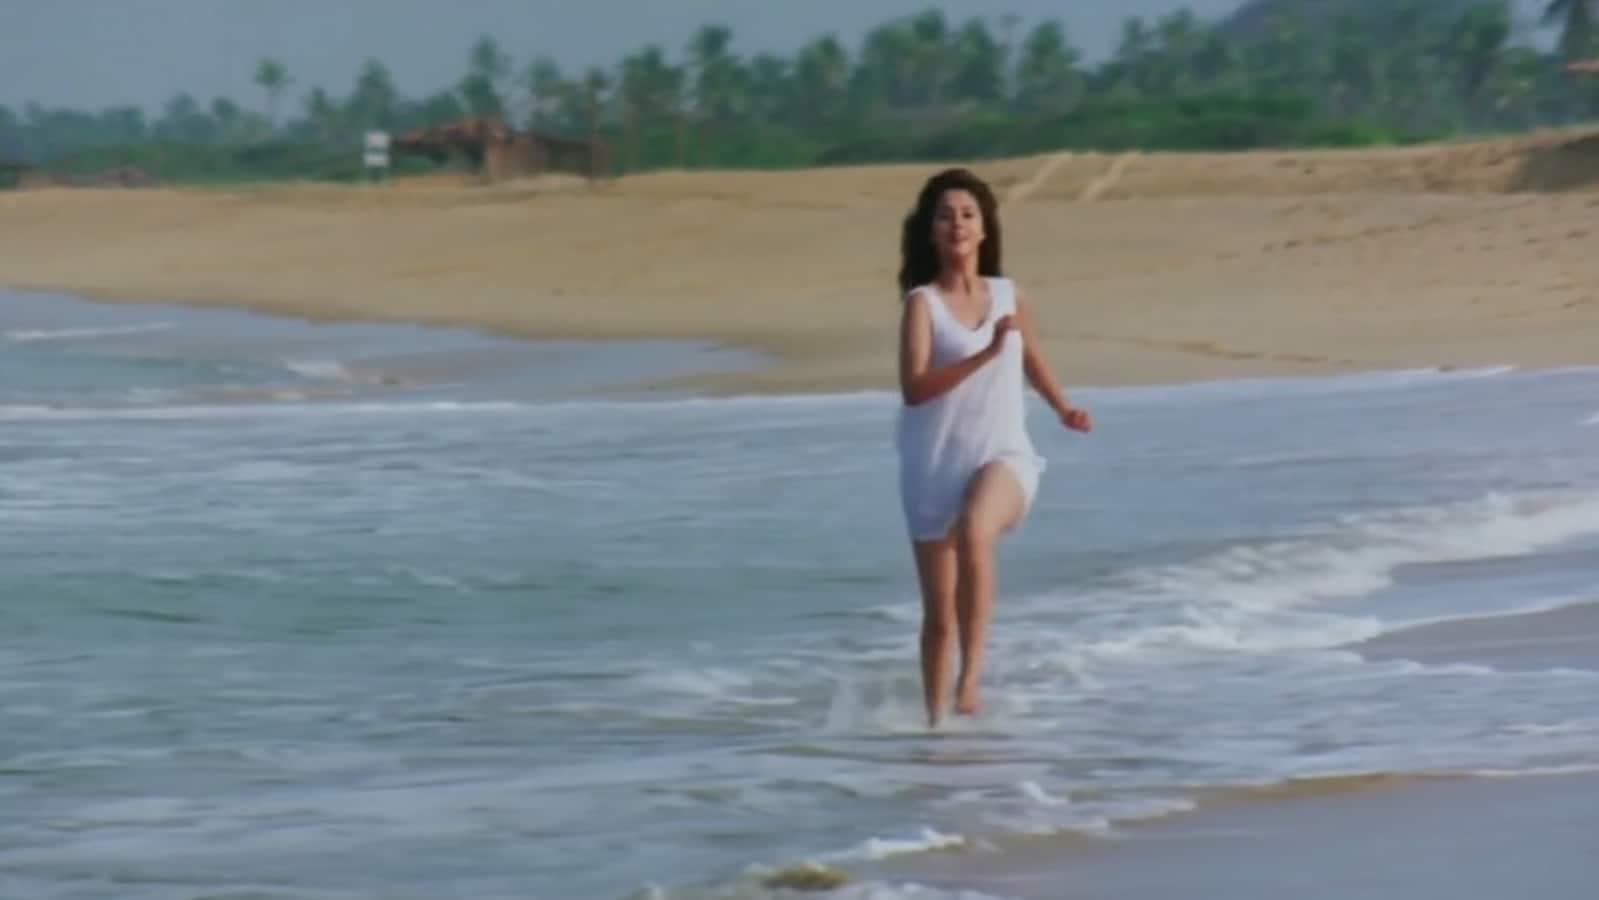 Urmila Matondkar reveals she wore Jackie Shroff's ganjee in Rangeela's Tanha Tanha song: 'To be honest, it was fun' | Bollywood - Hindustan Times